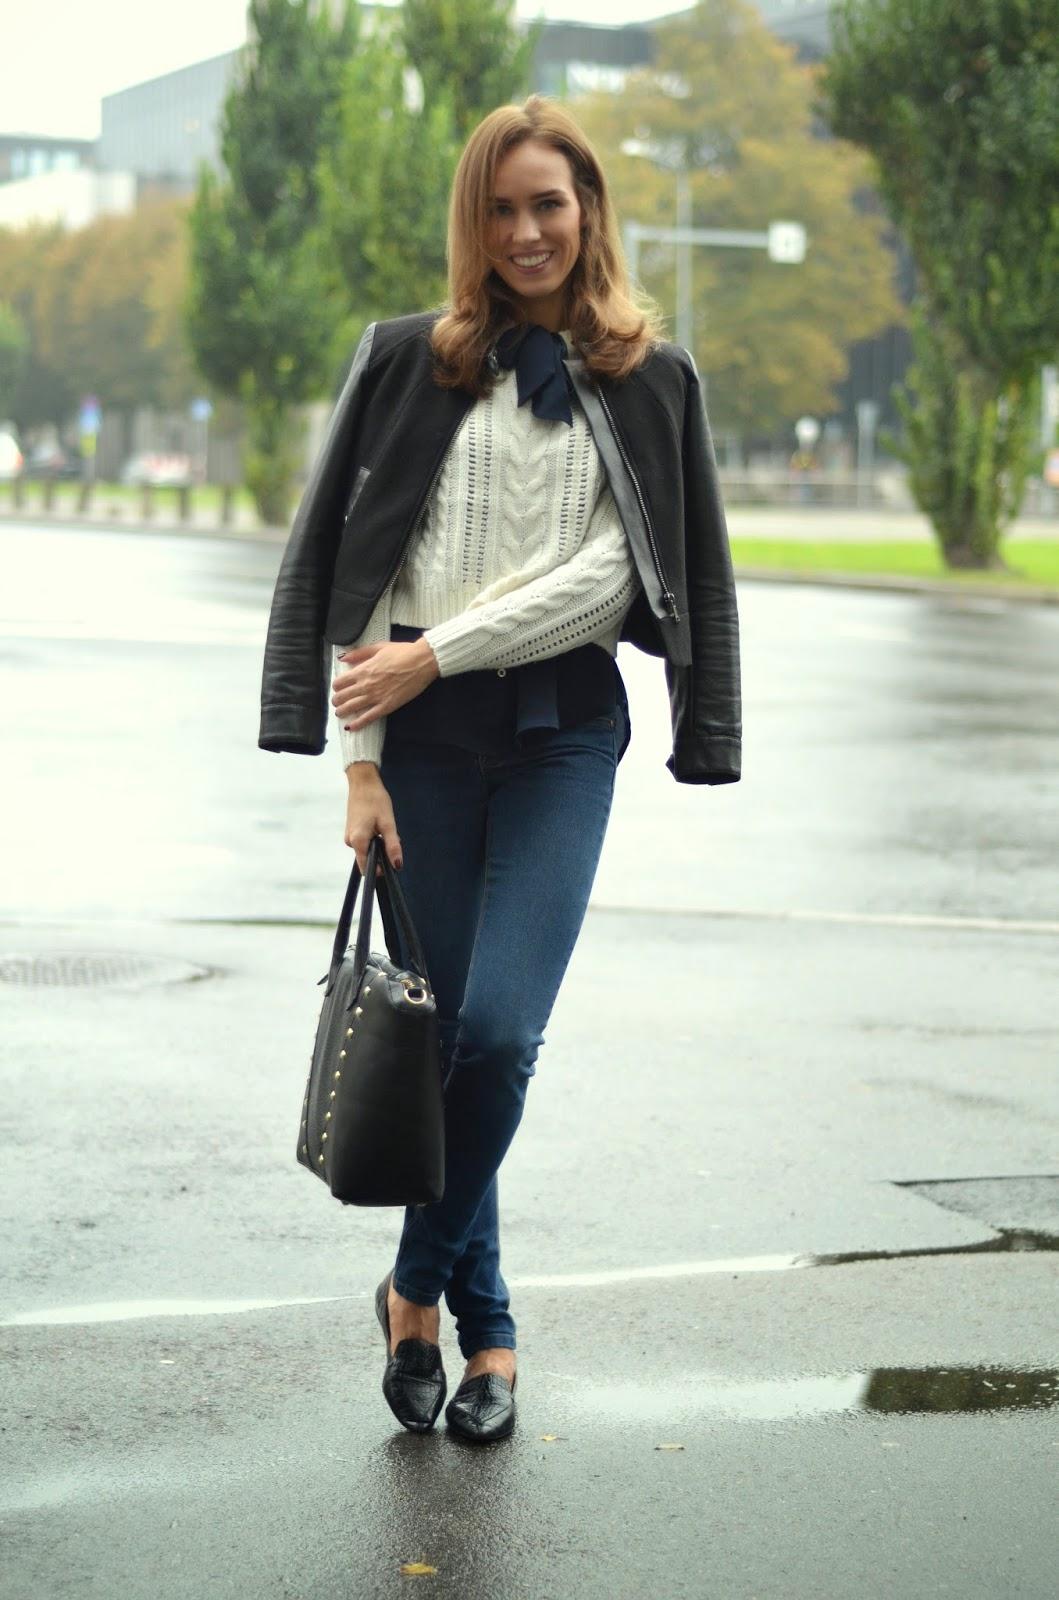 crop-knitwear-bowtie-blouse-slim-jeans-flats-outfit